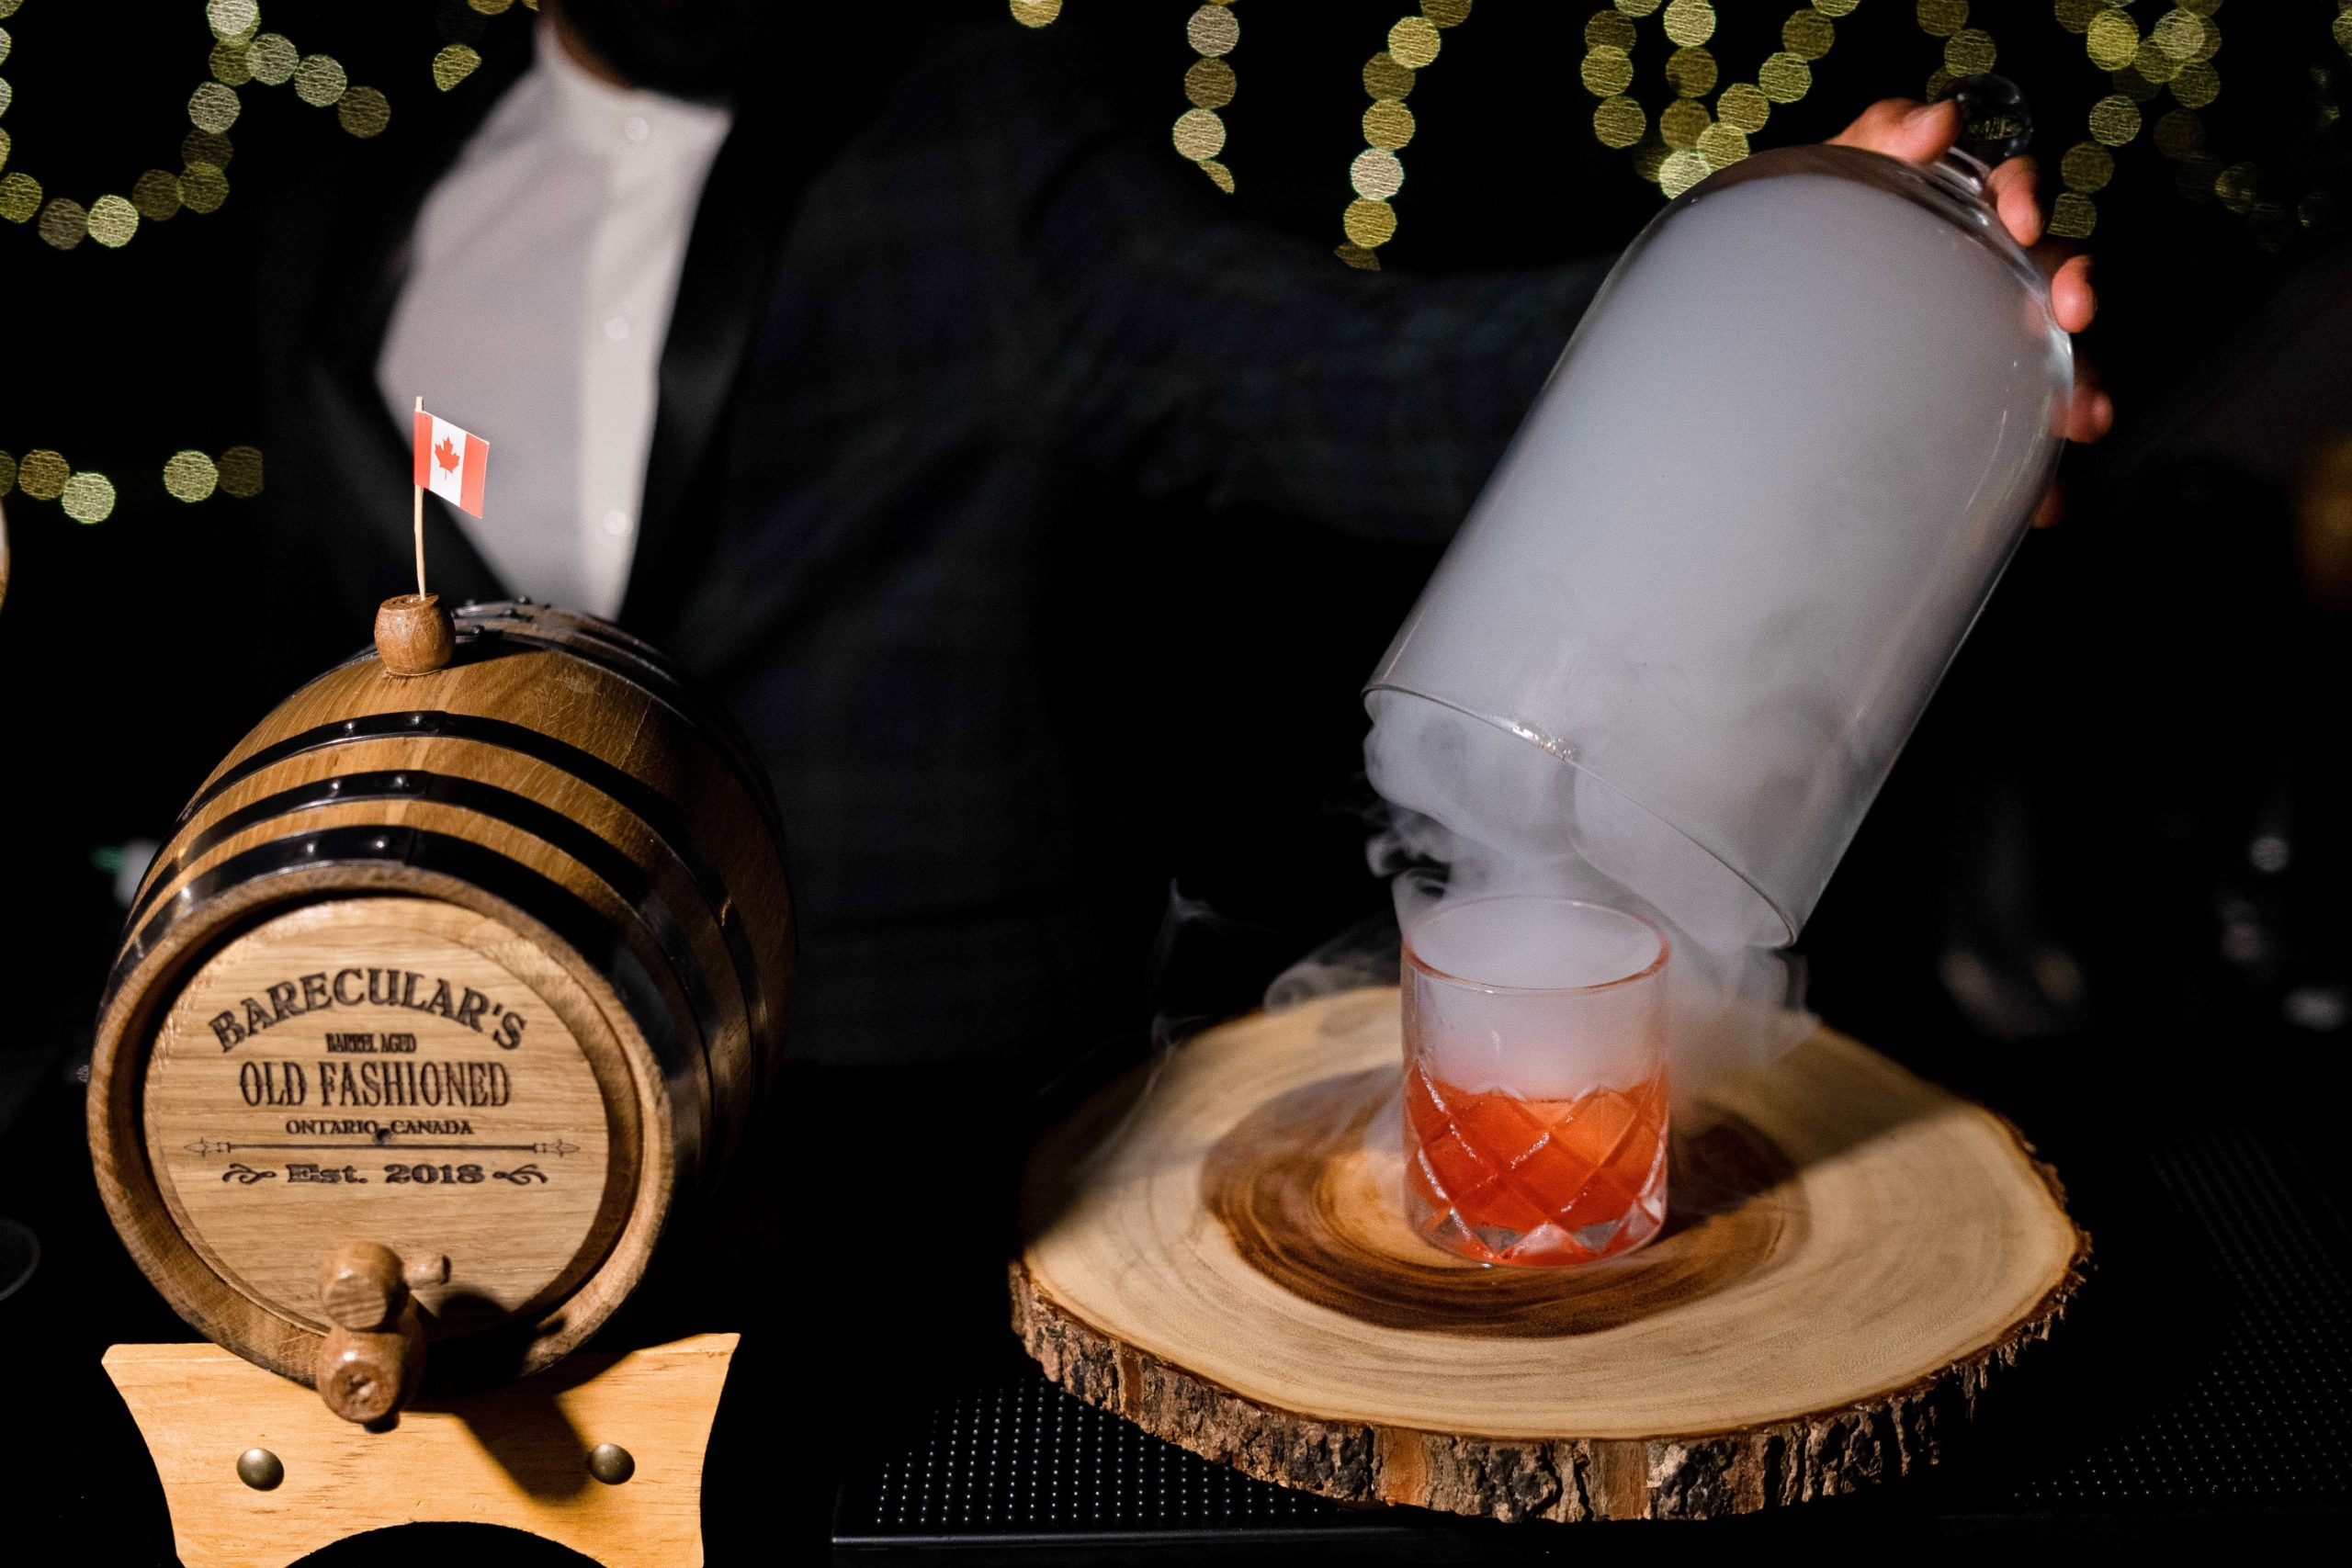 Barecular's Barrel Aged Old Fashioned